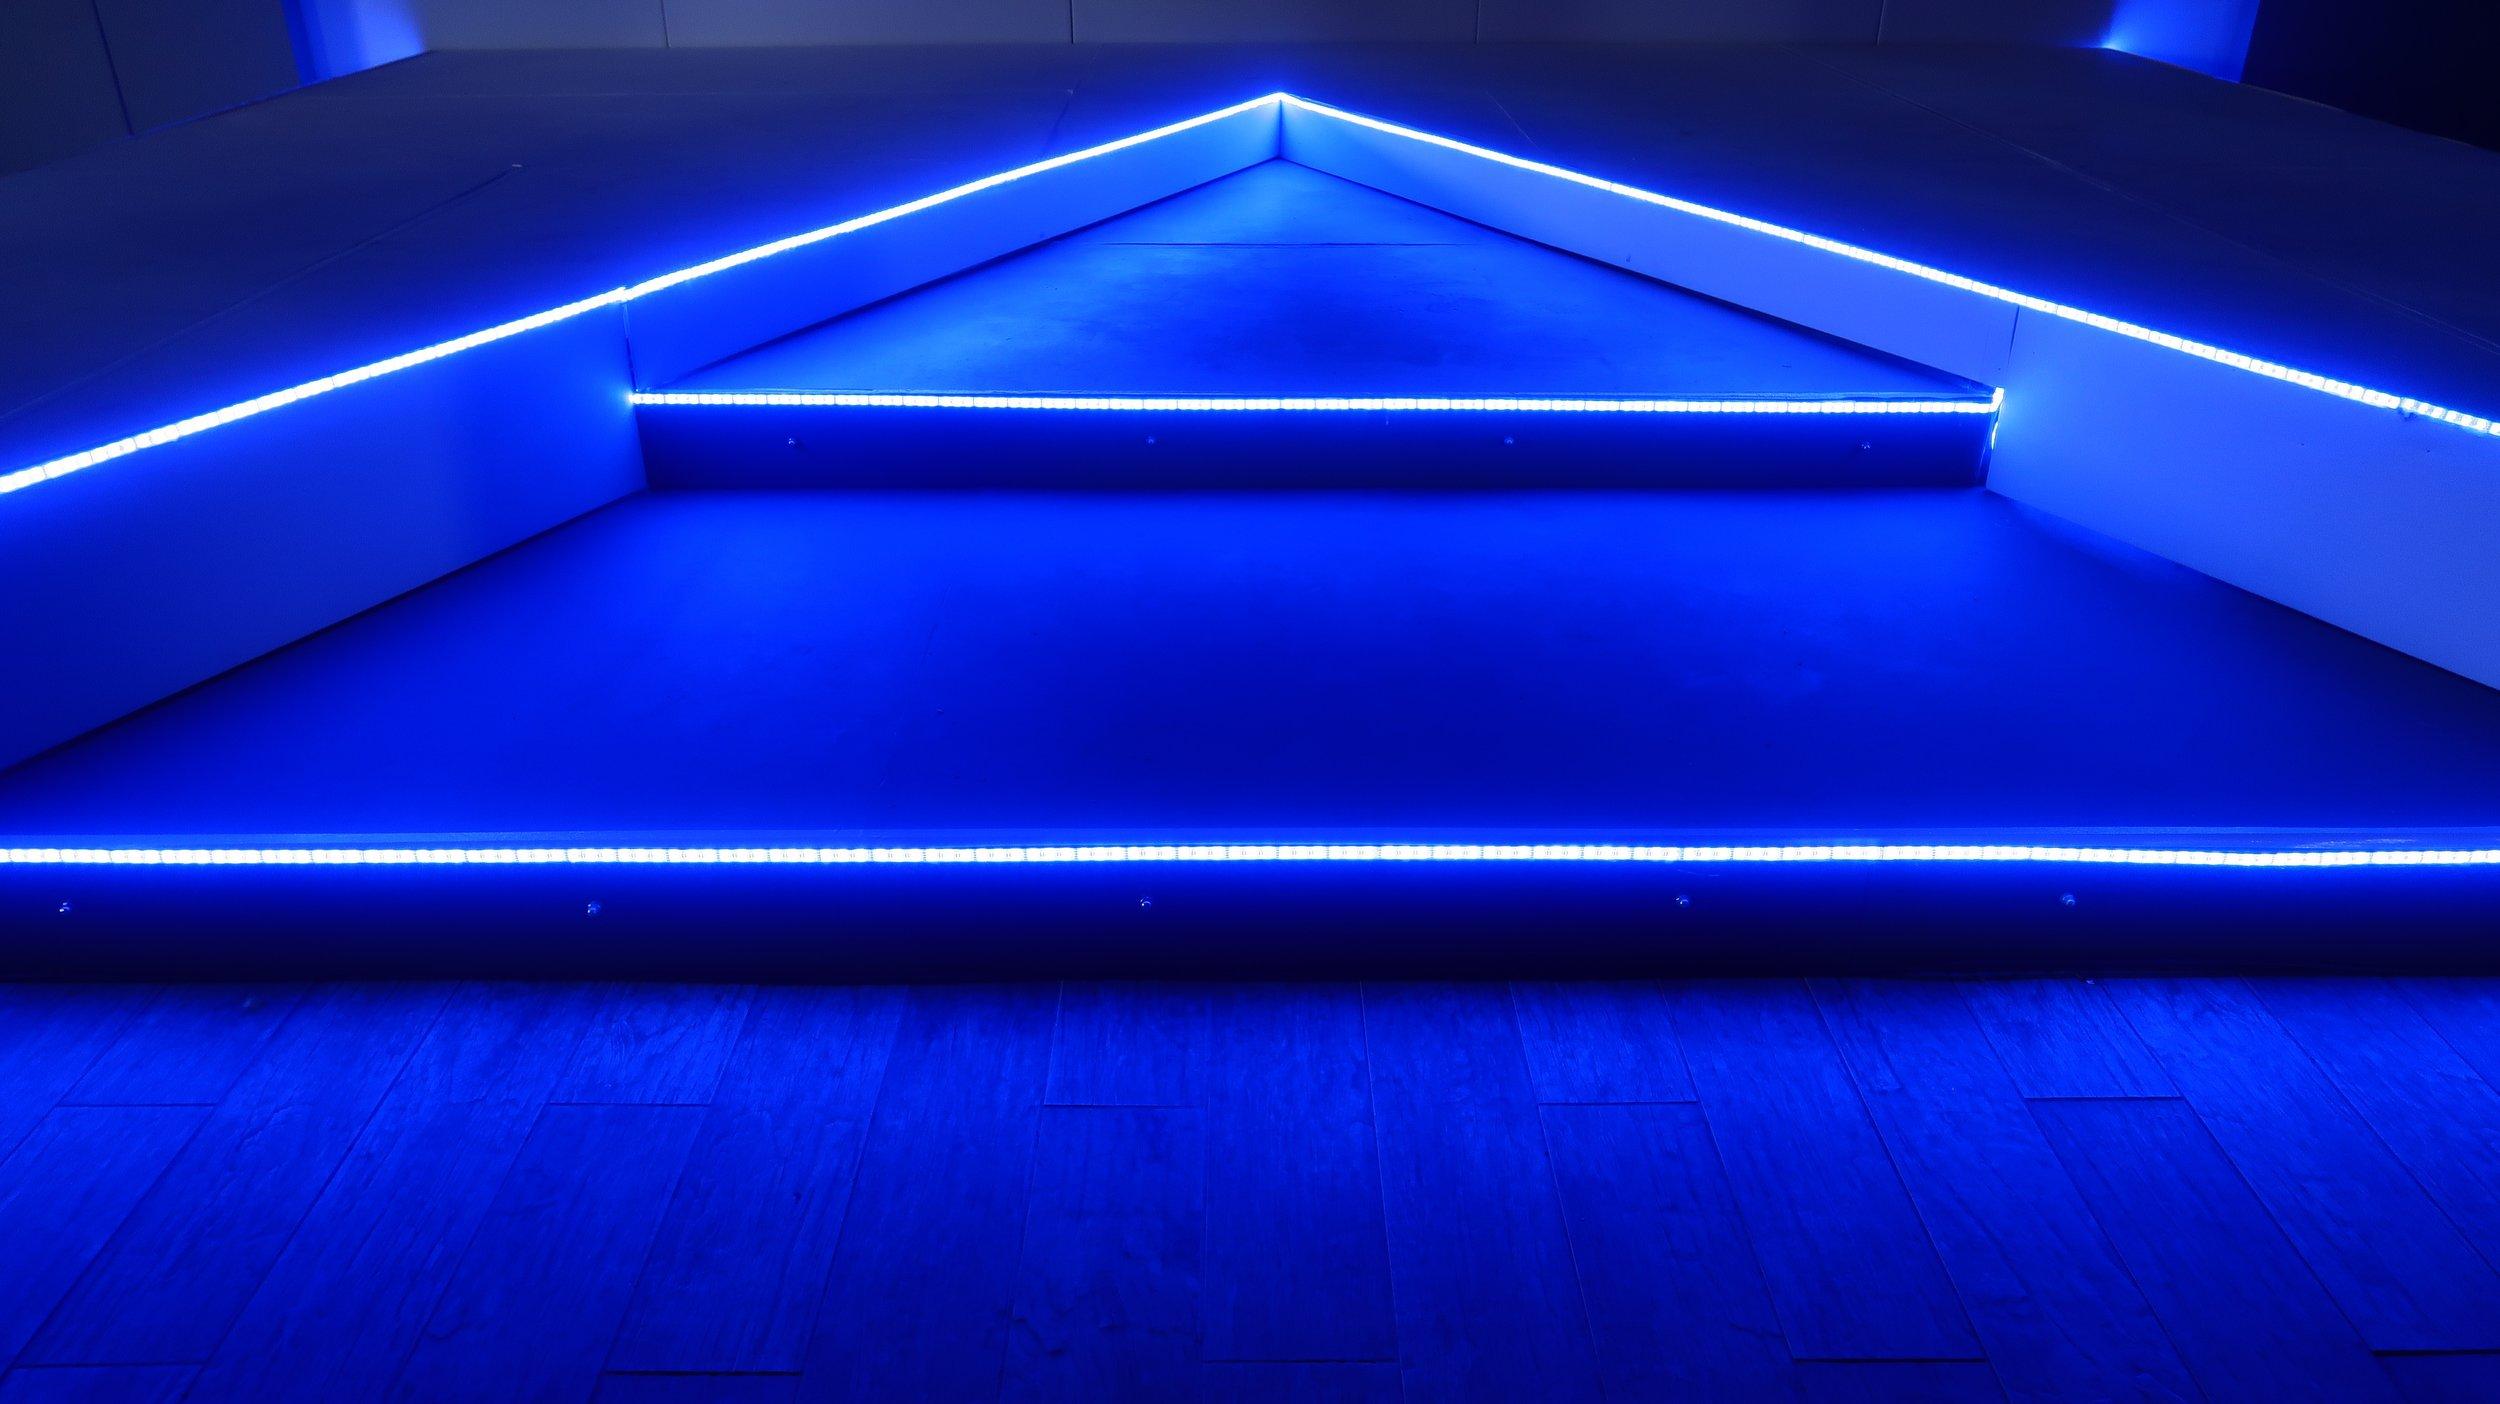 ARGON - BLUE